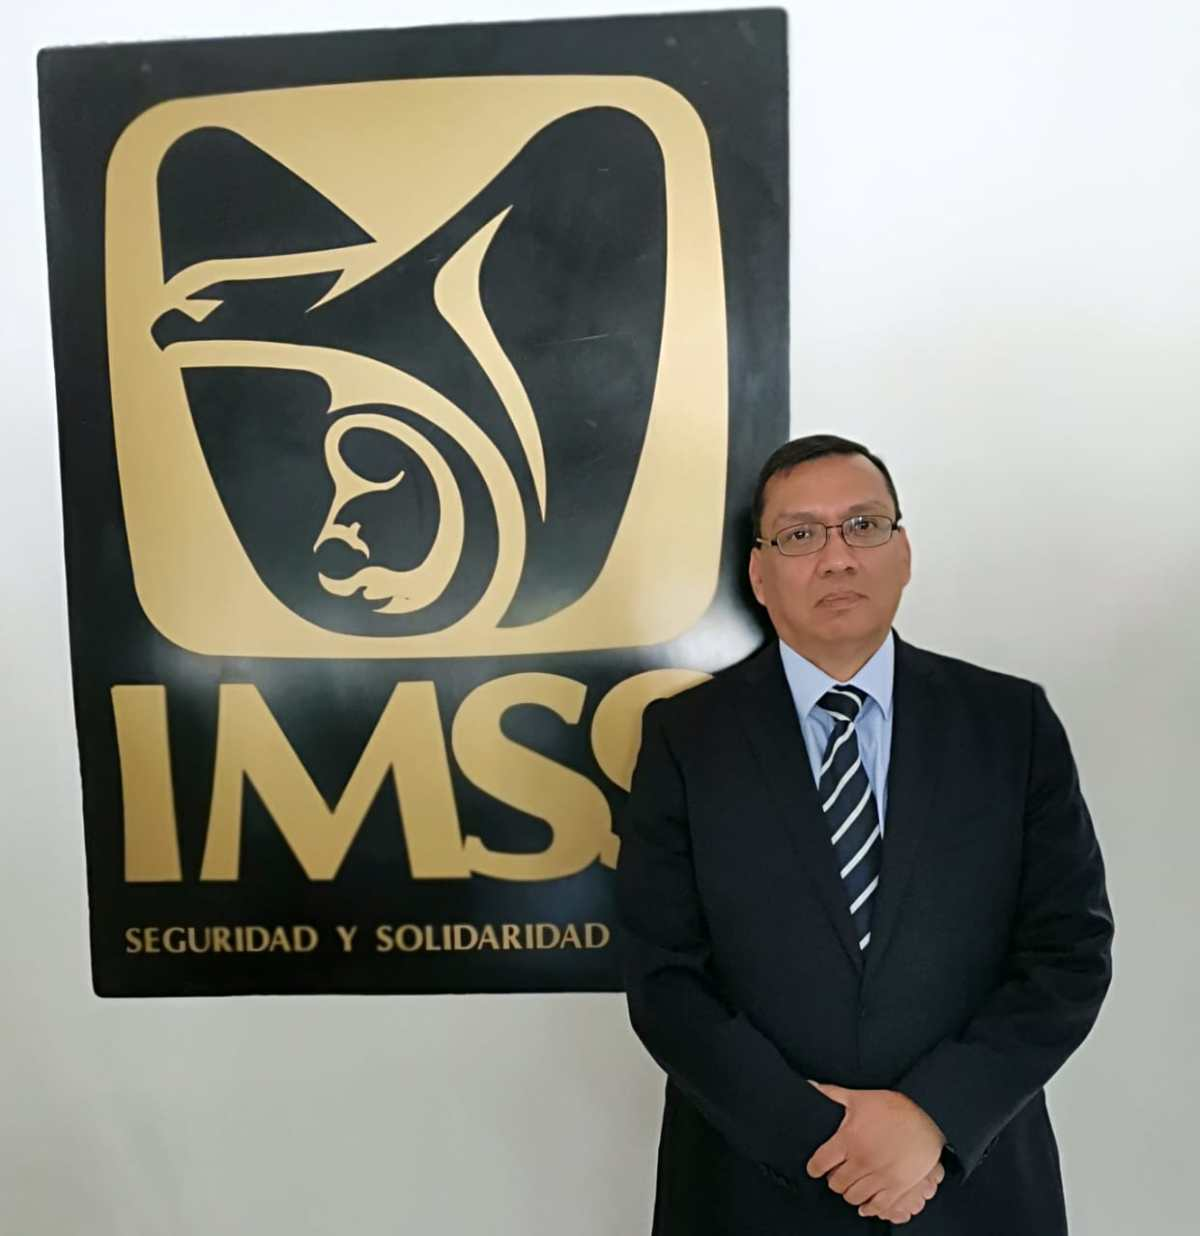 JOSÉ LUIS ARANZA AGUILAR TOMÓ POSESIÓN COMO REPRESENTANTE DEL IMSS ENTLAXCALA